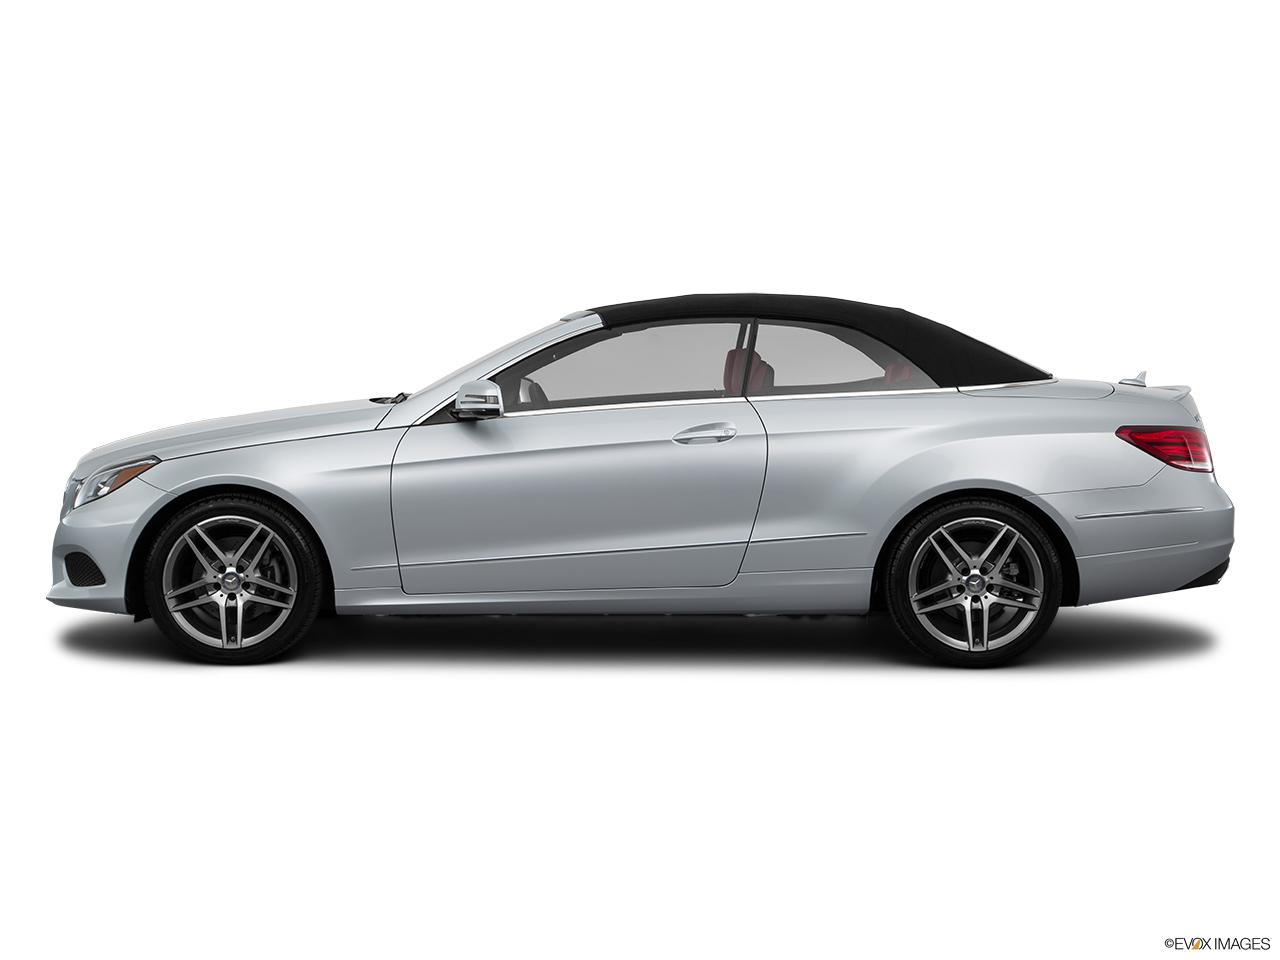 Mercedes benz e class cabriolet 2016 e 250 in uae new car for 2016 mercedes benz e class convertible